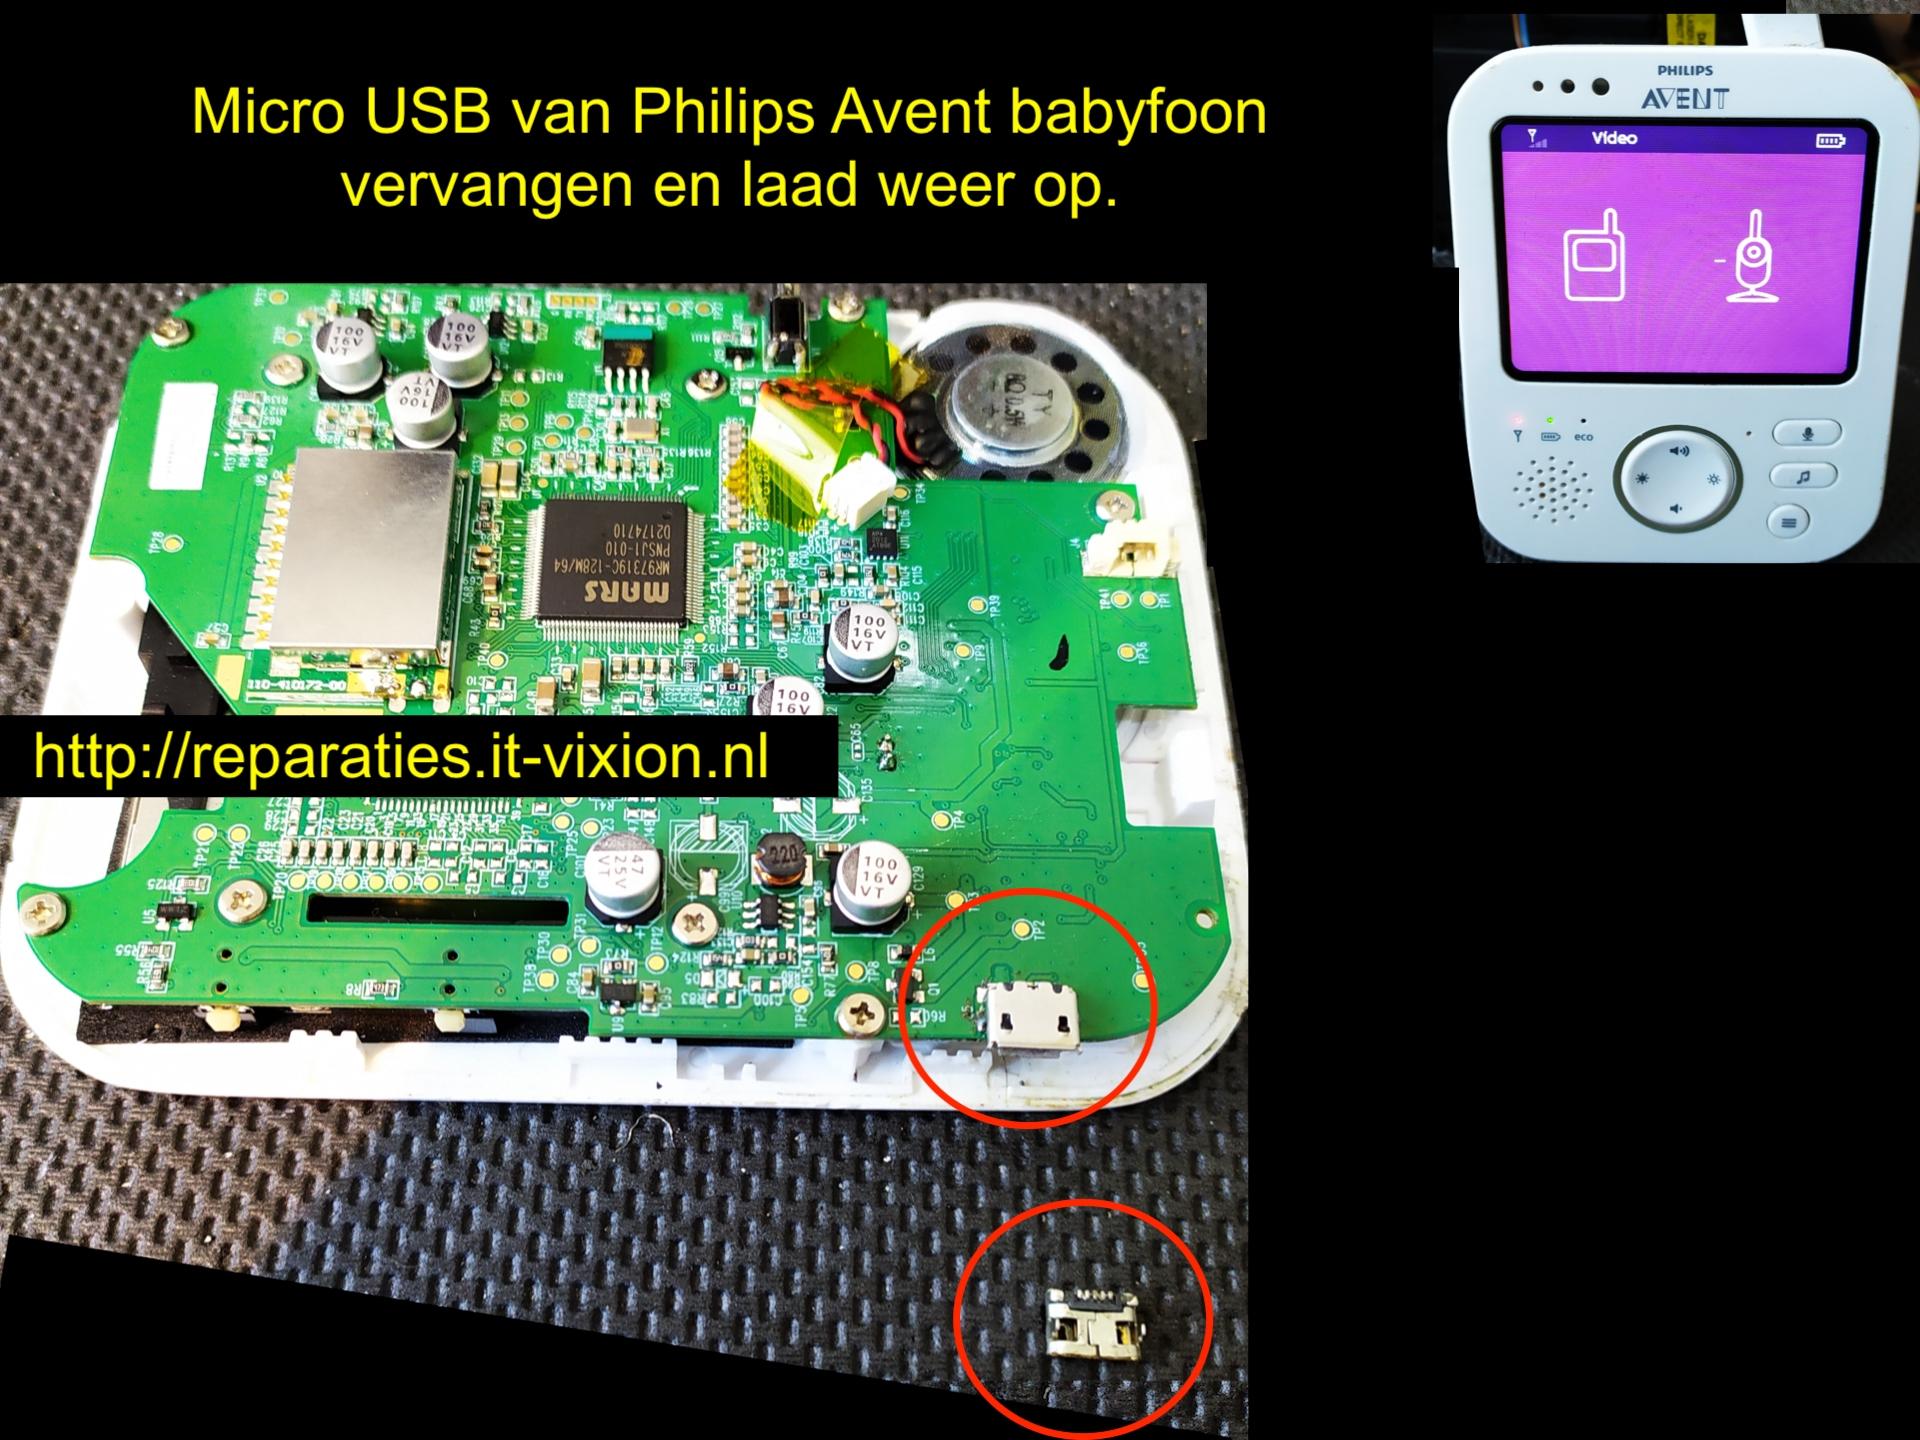 Philips AVENT Babyfoon